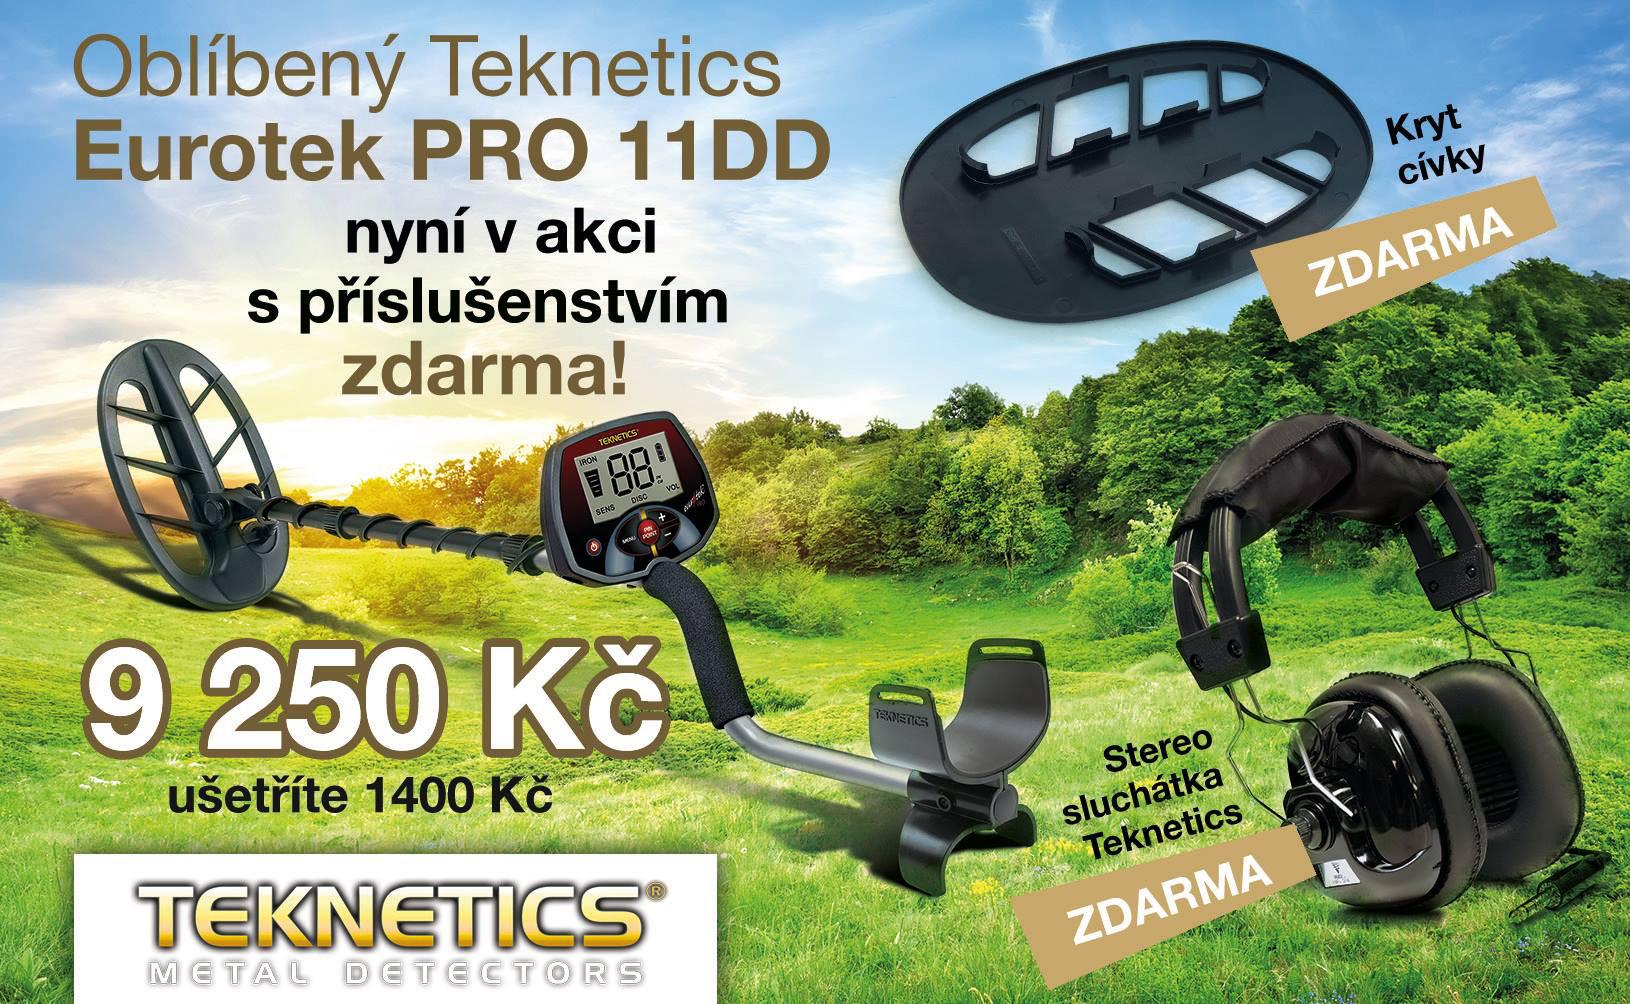 teknetics eurotek pro 11DD - detektor kovů SET